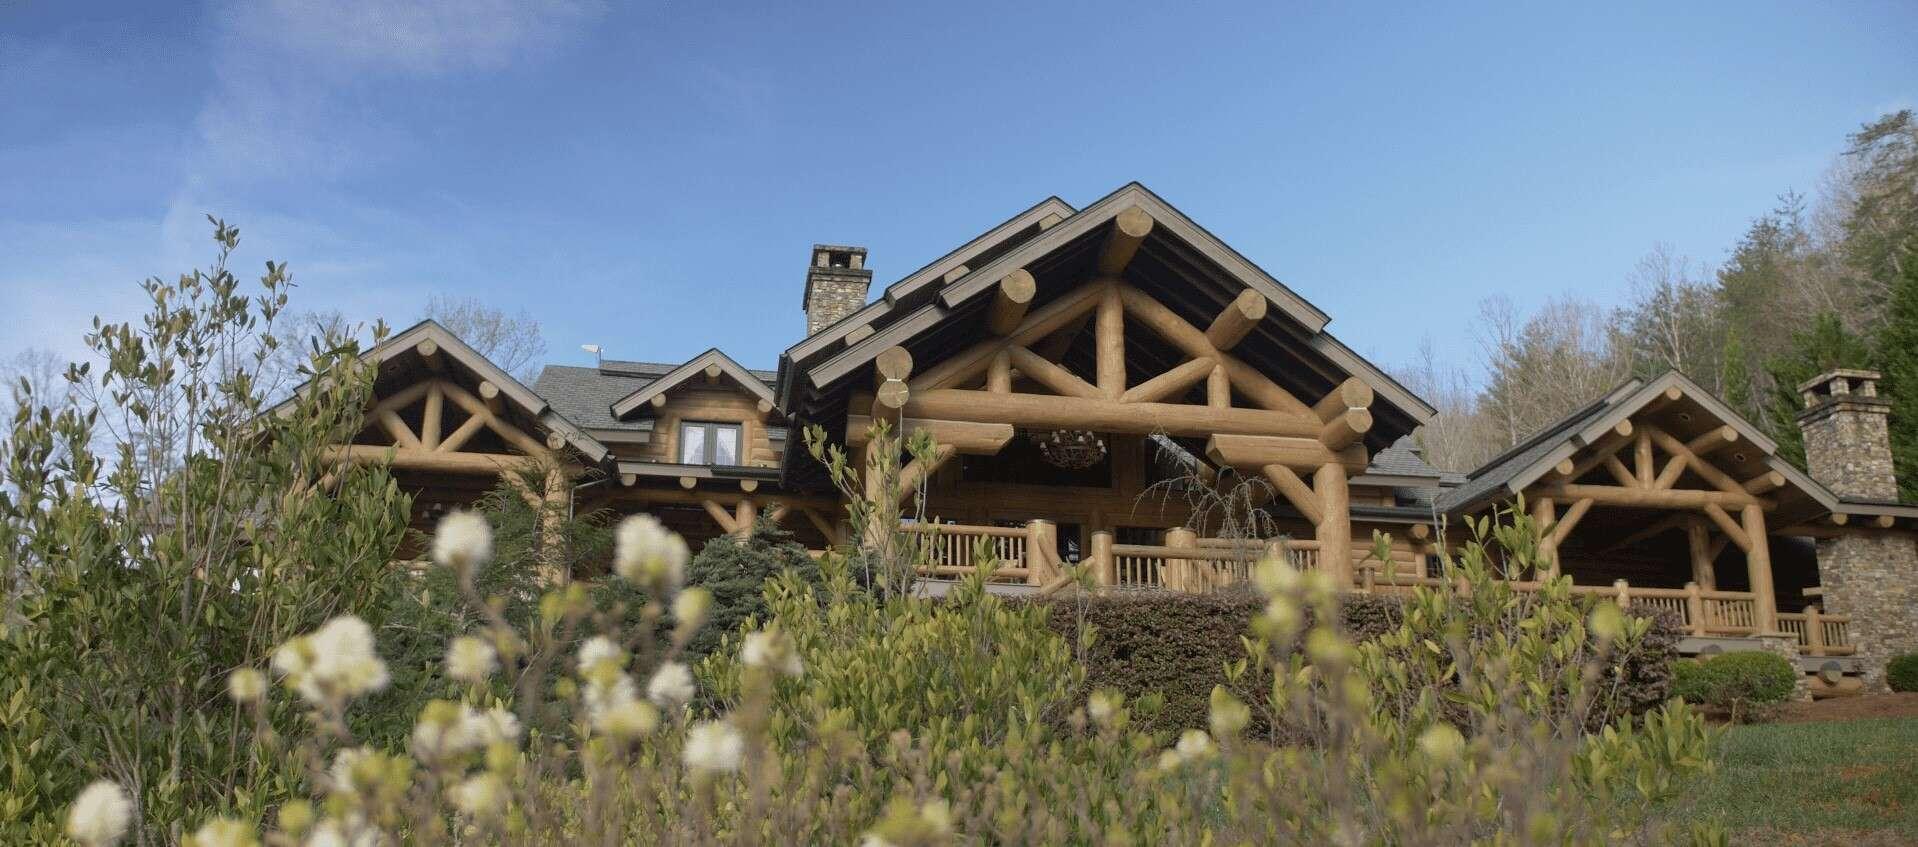 - Bear Paw Lodge - Image 1/16